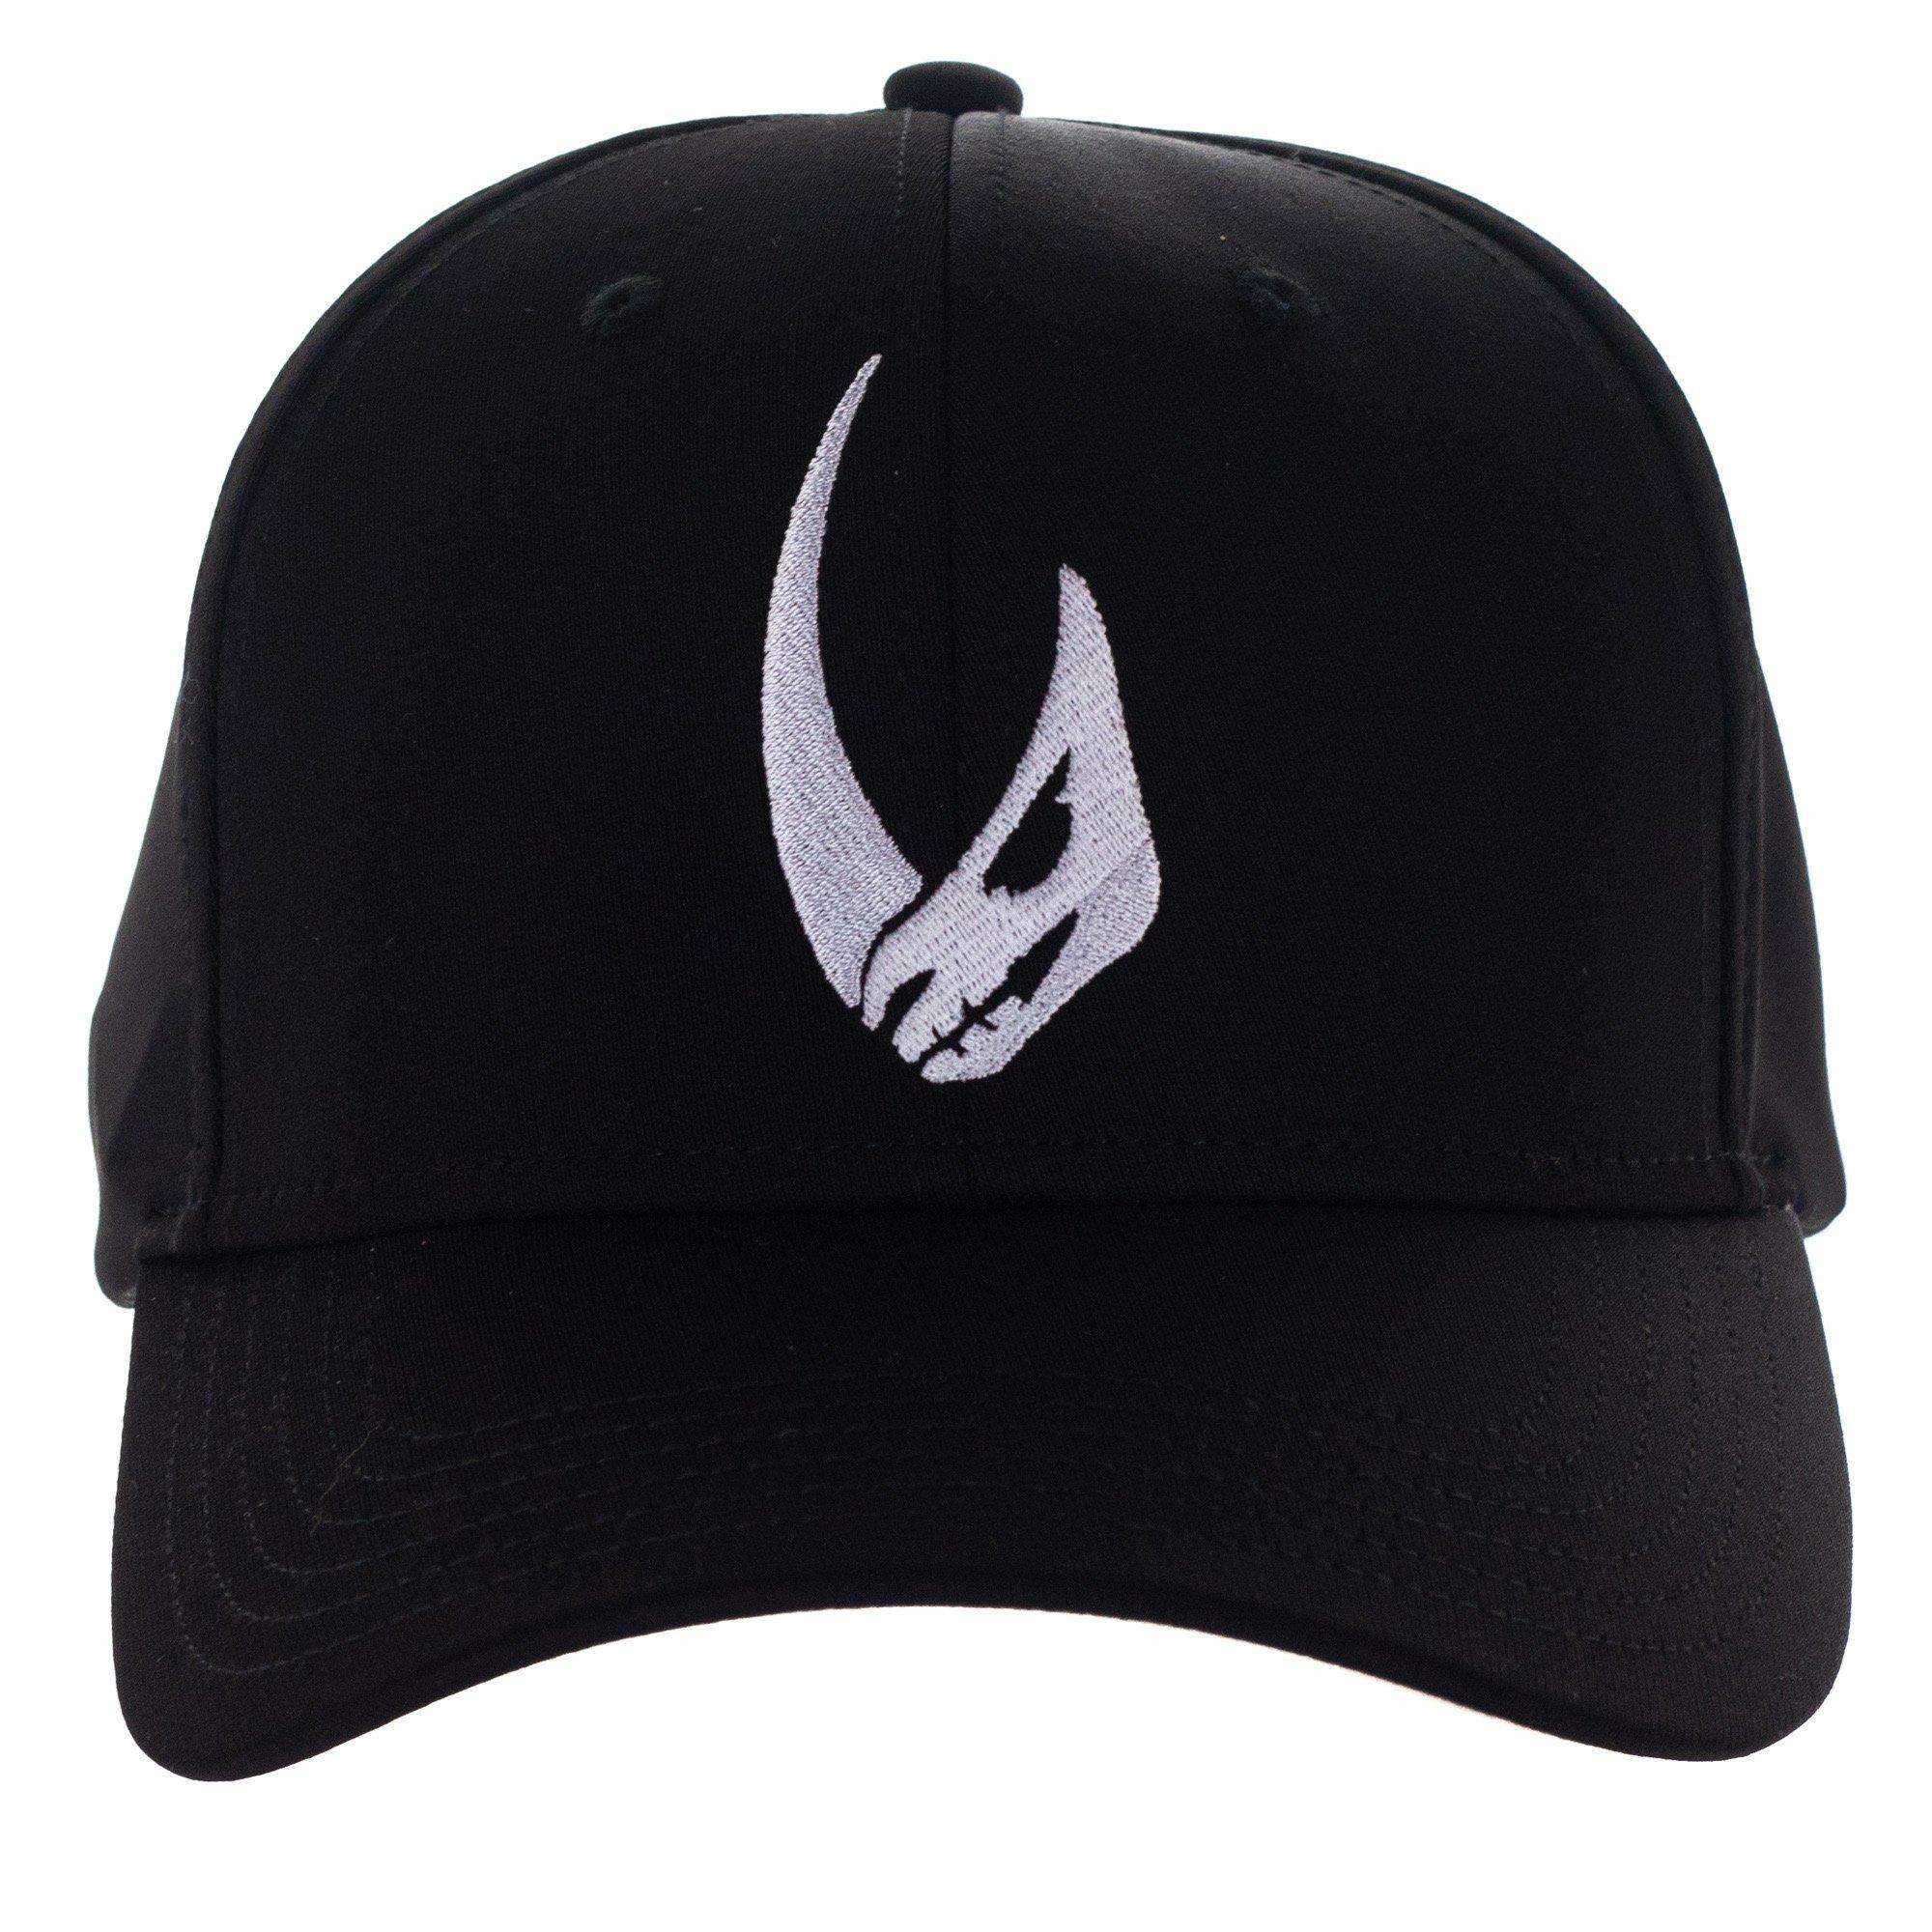 The Manda-lorian Baseball Cap Vintage Hat Adjustable Youth Hat